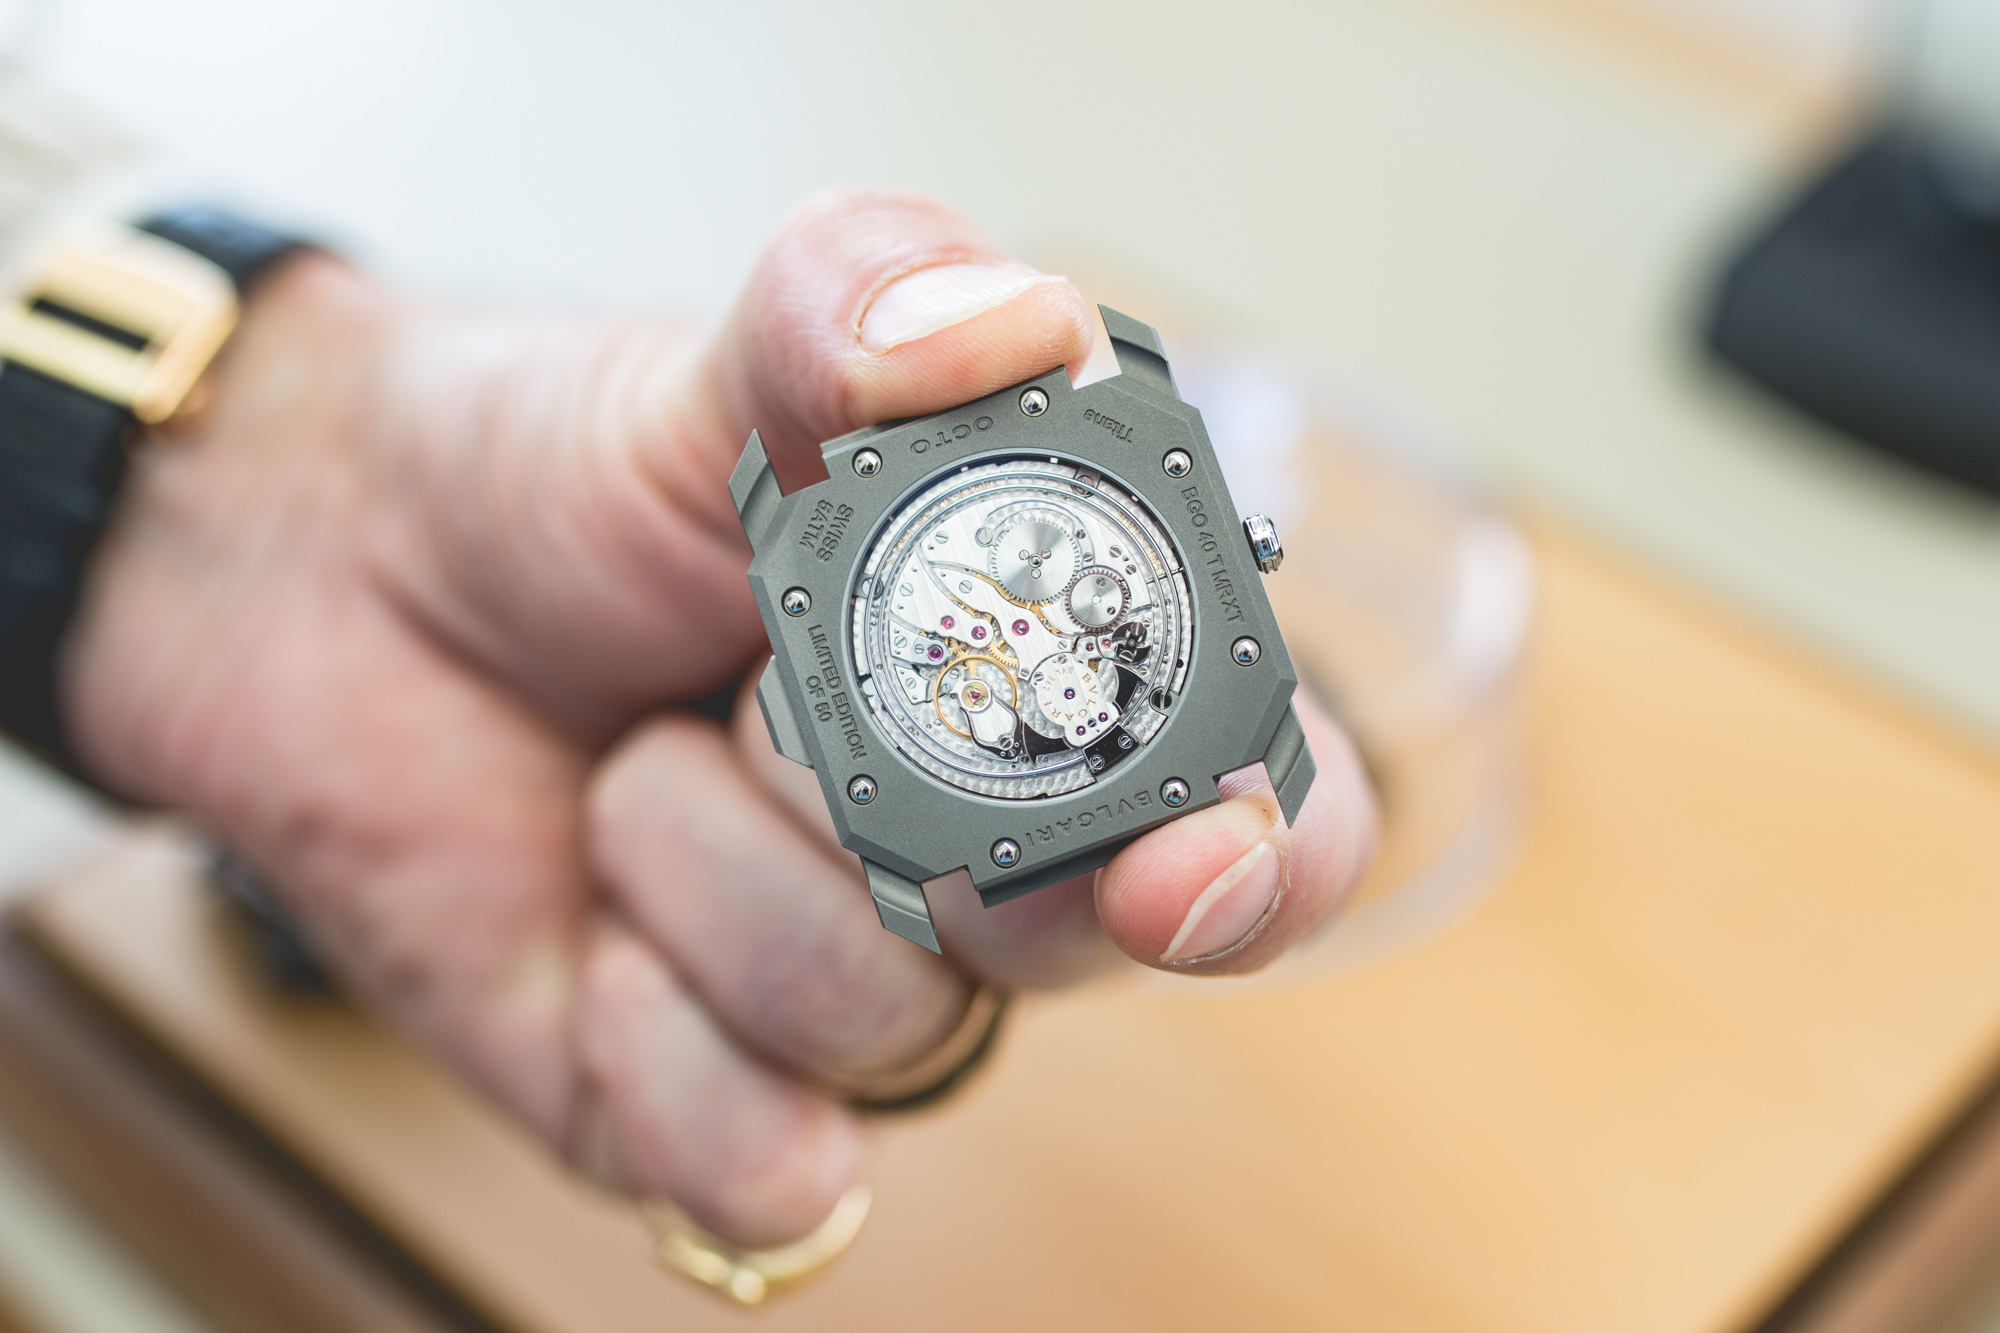 Discover the Wonders of SIHH 2019 - Clockwork Mechanisms horlogerie The Detailed Watchmaking Art in Haute Horlogerie Discover the Wonders of SIHH 2019 Clockwork Mechanisms 1